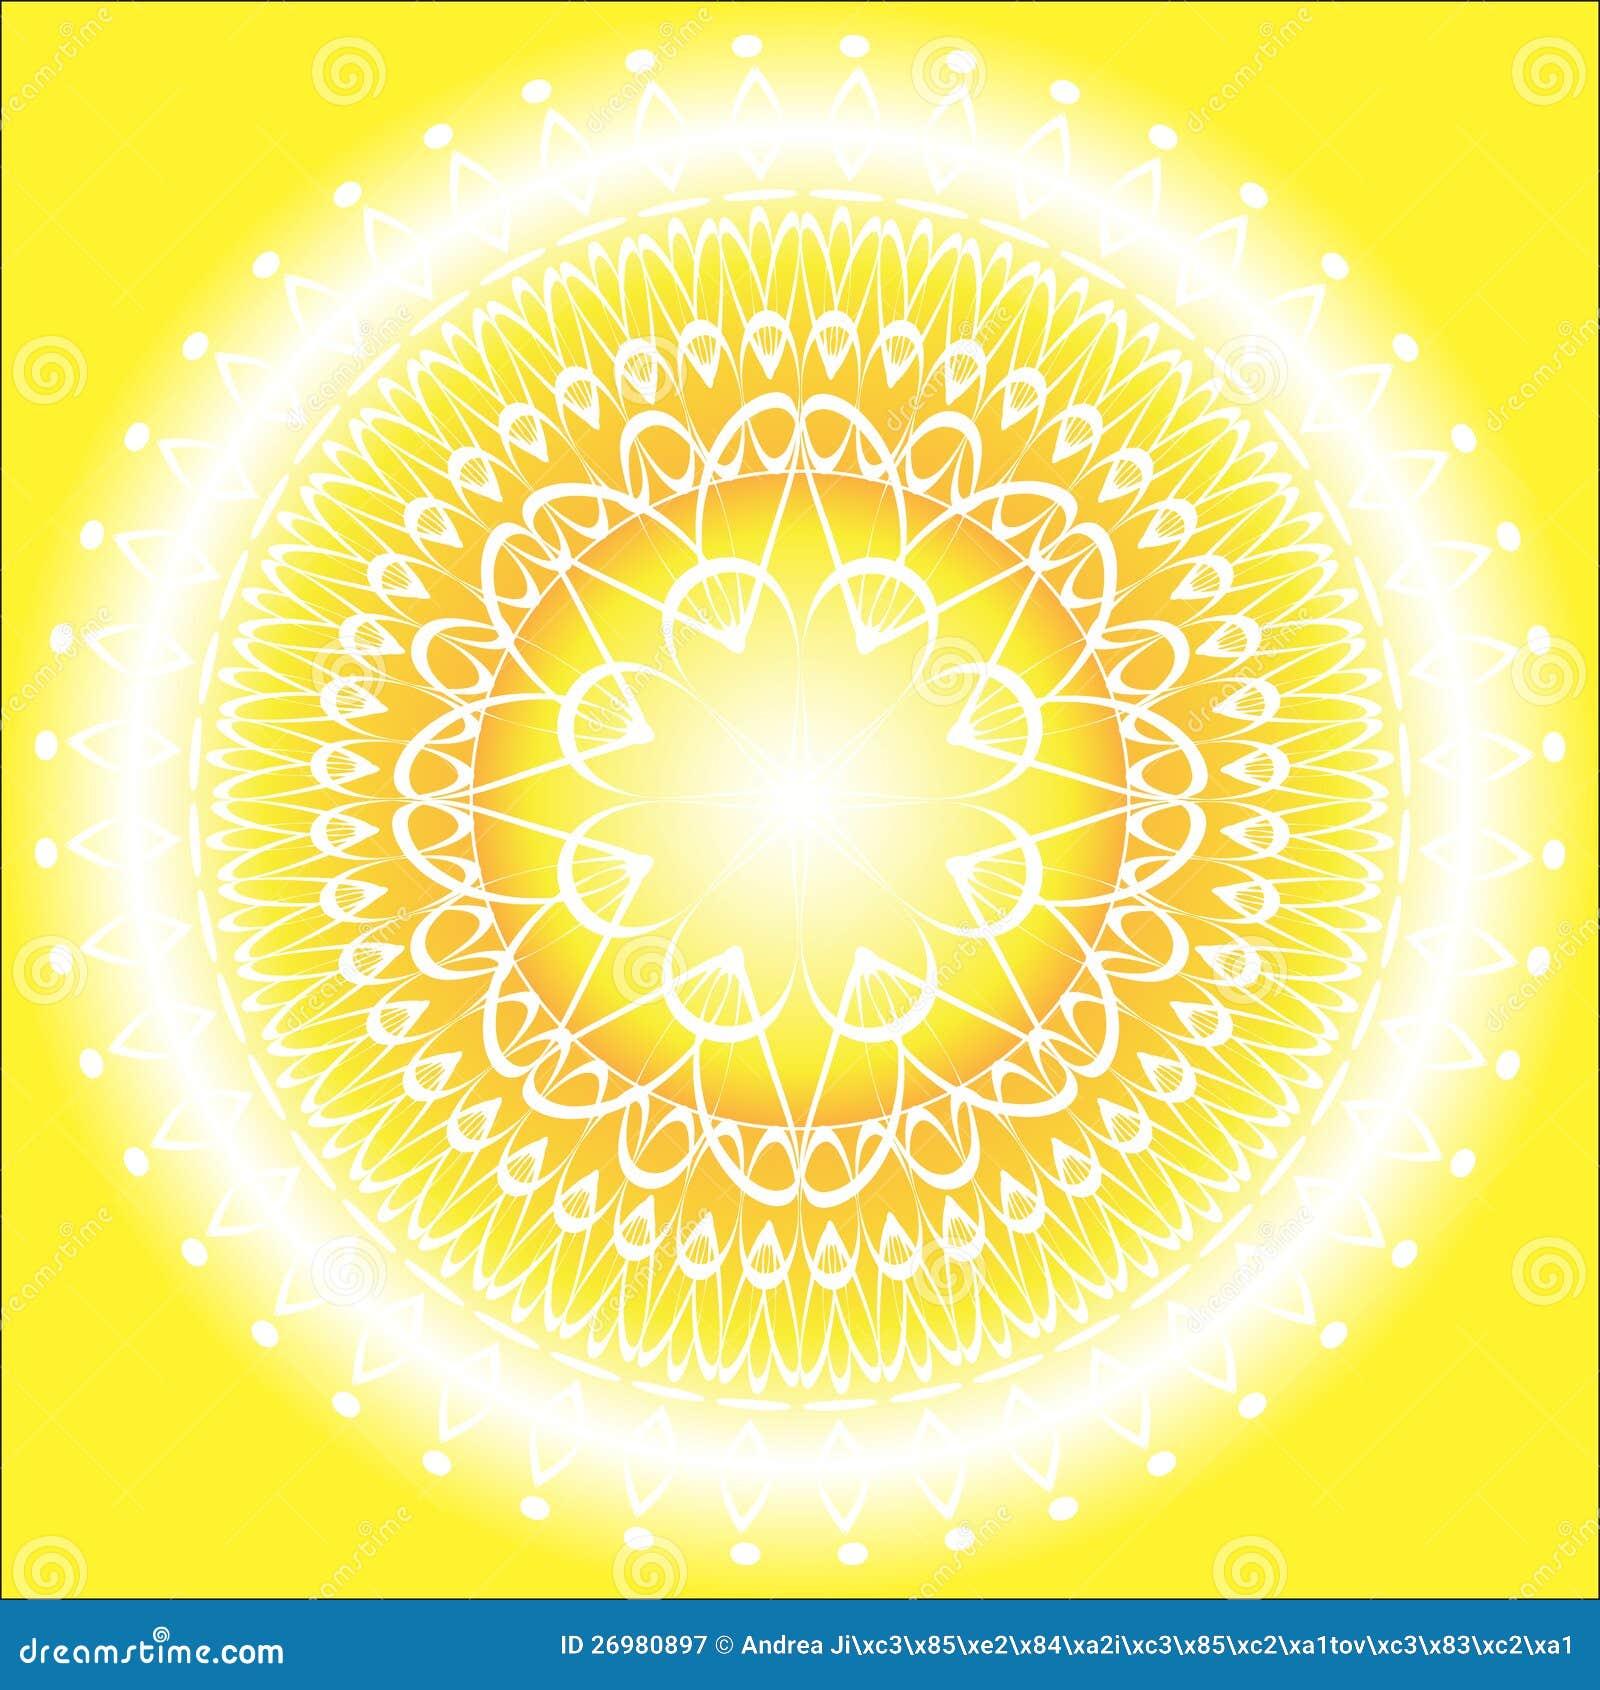 A l persian star - 2 7